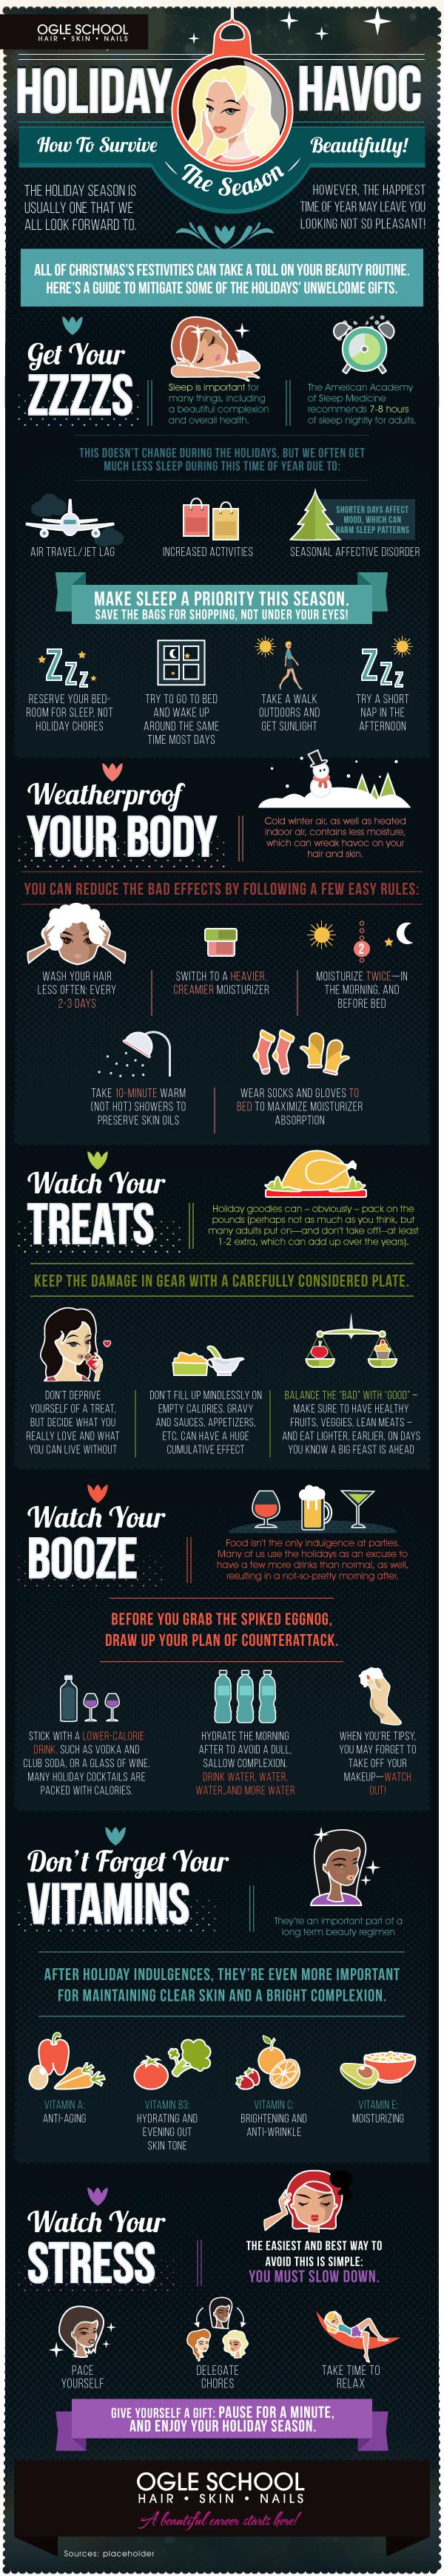 Holiday Havoc: How To Survive The Season Beautifully #infographic #Beauty #infographics #Holiday Havoc #Health & Beauty